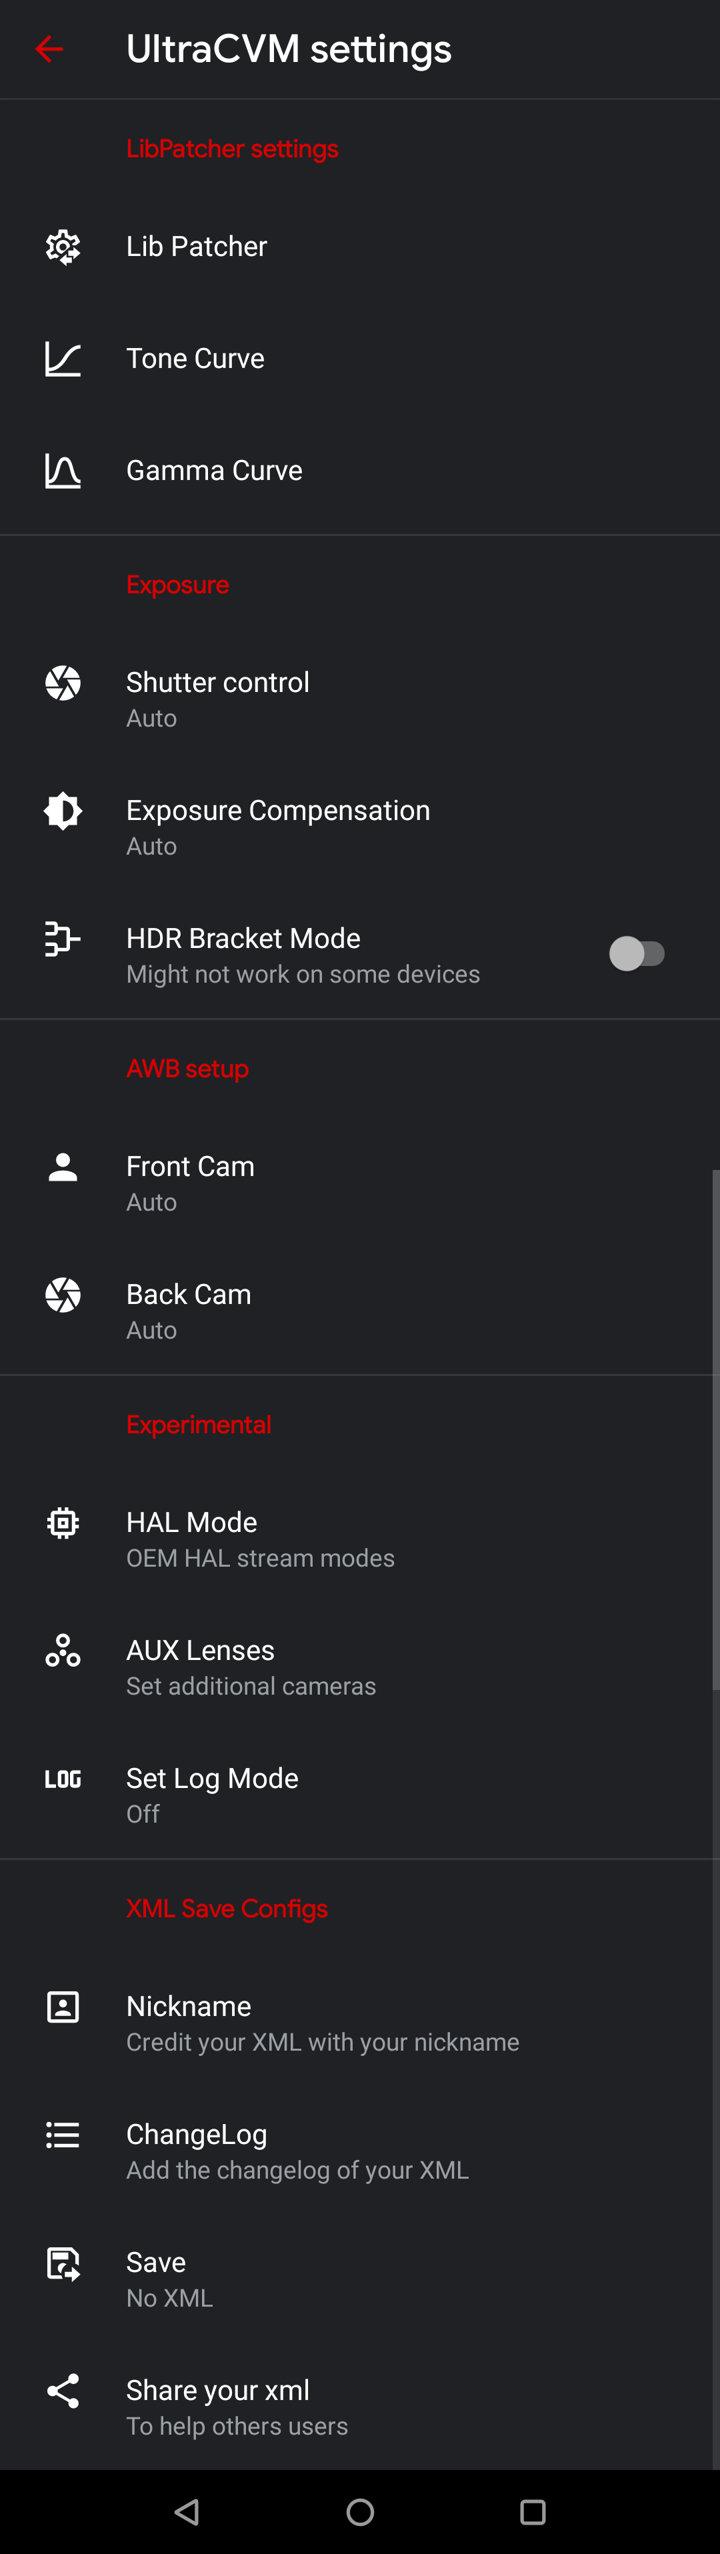 Settings of Ultra CVM Mod